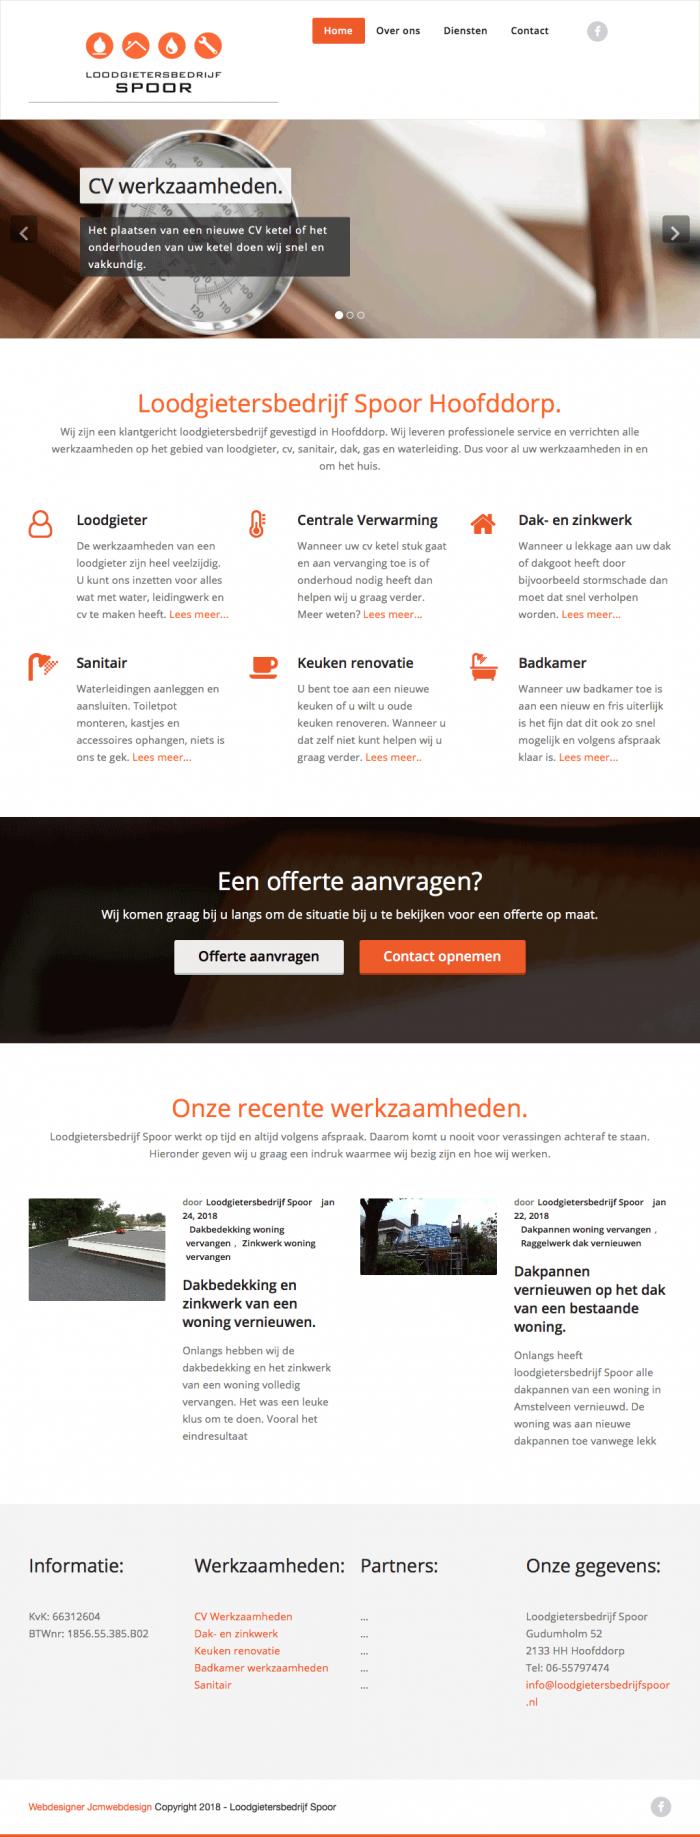 Portfolio-Wordpress-Webdesginer-Jcmwebdesign-Loodgietersbedrijf-Spoor